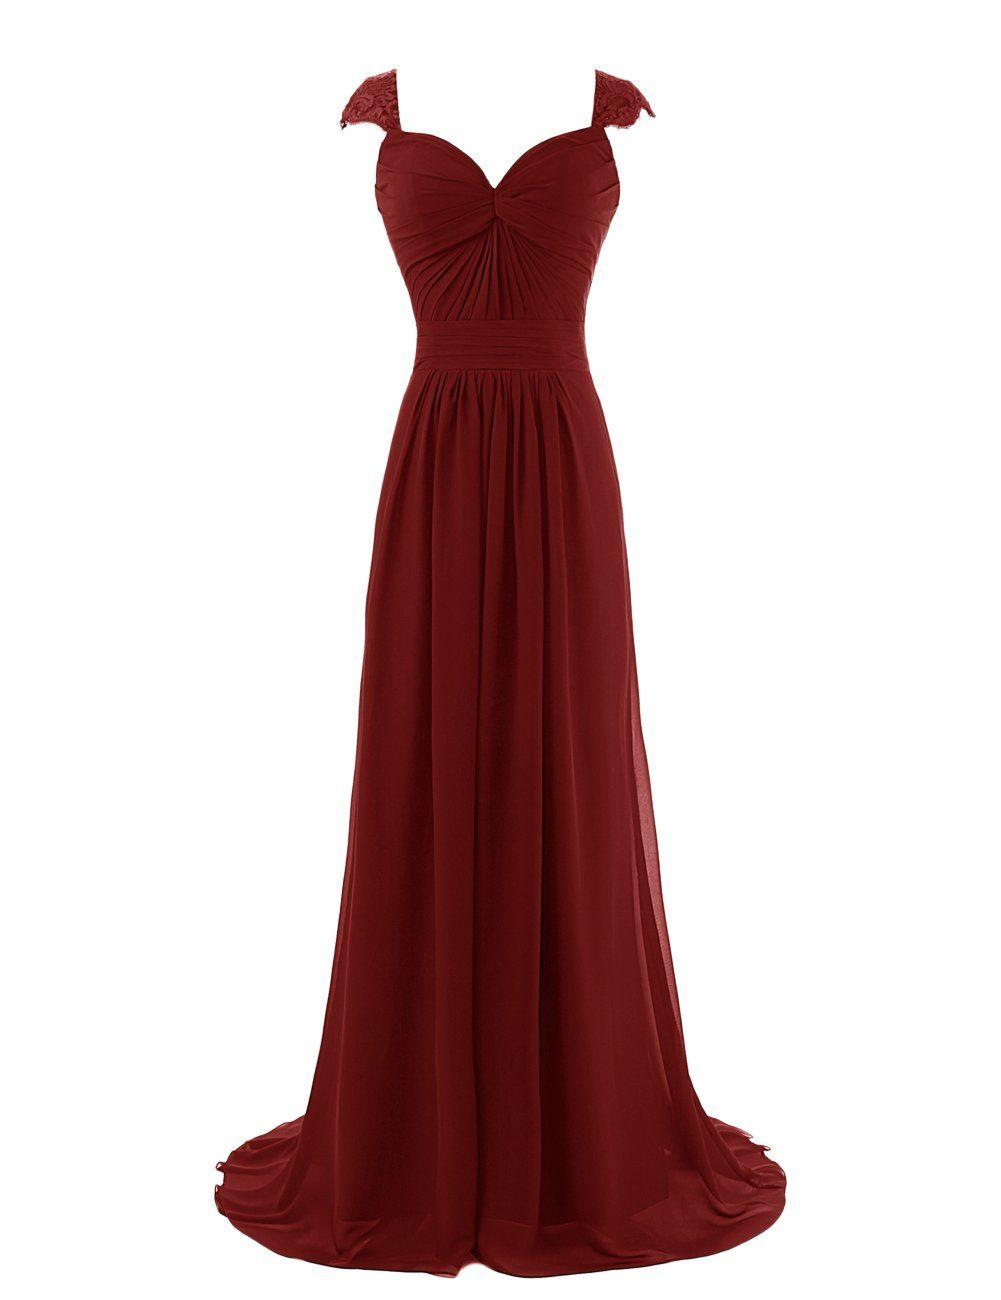 Diyouth long elegant chiffon sweetheart prom bridesmaid dress with